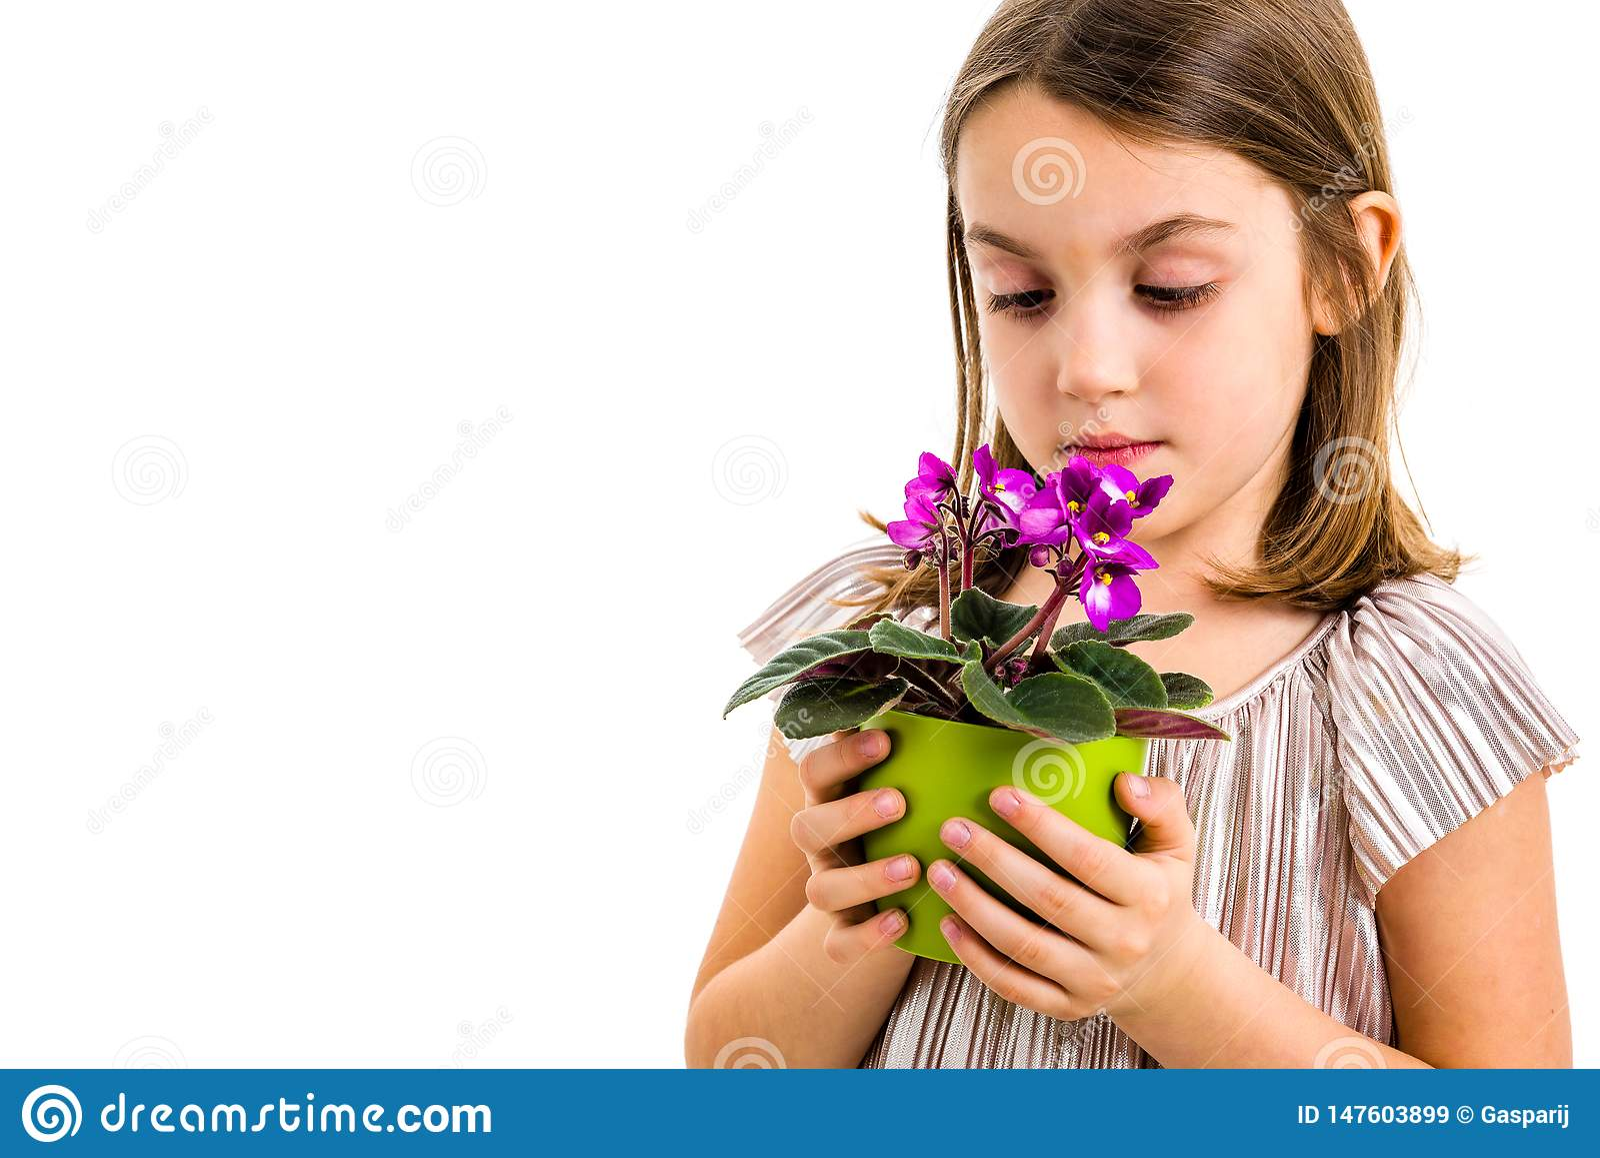 Little Girl Holding Flowers Stock Photo - Image of